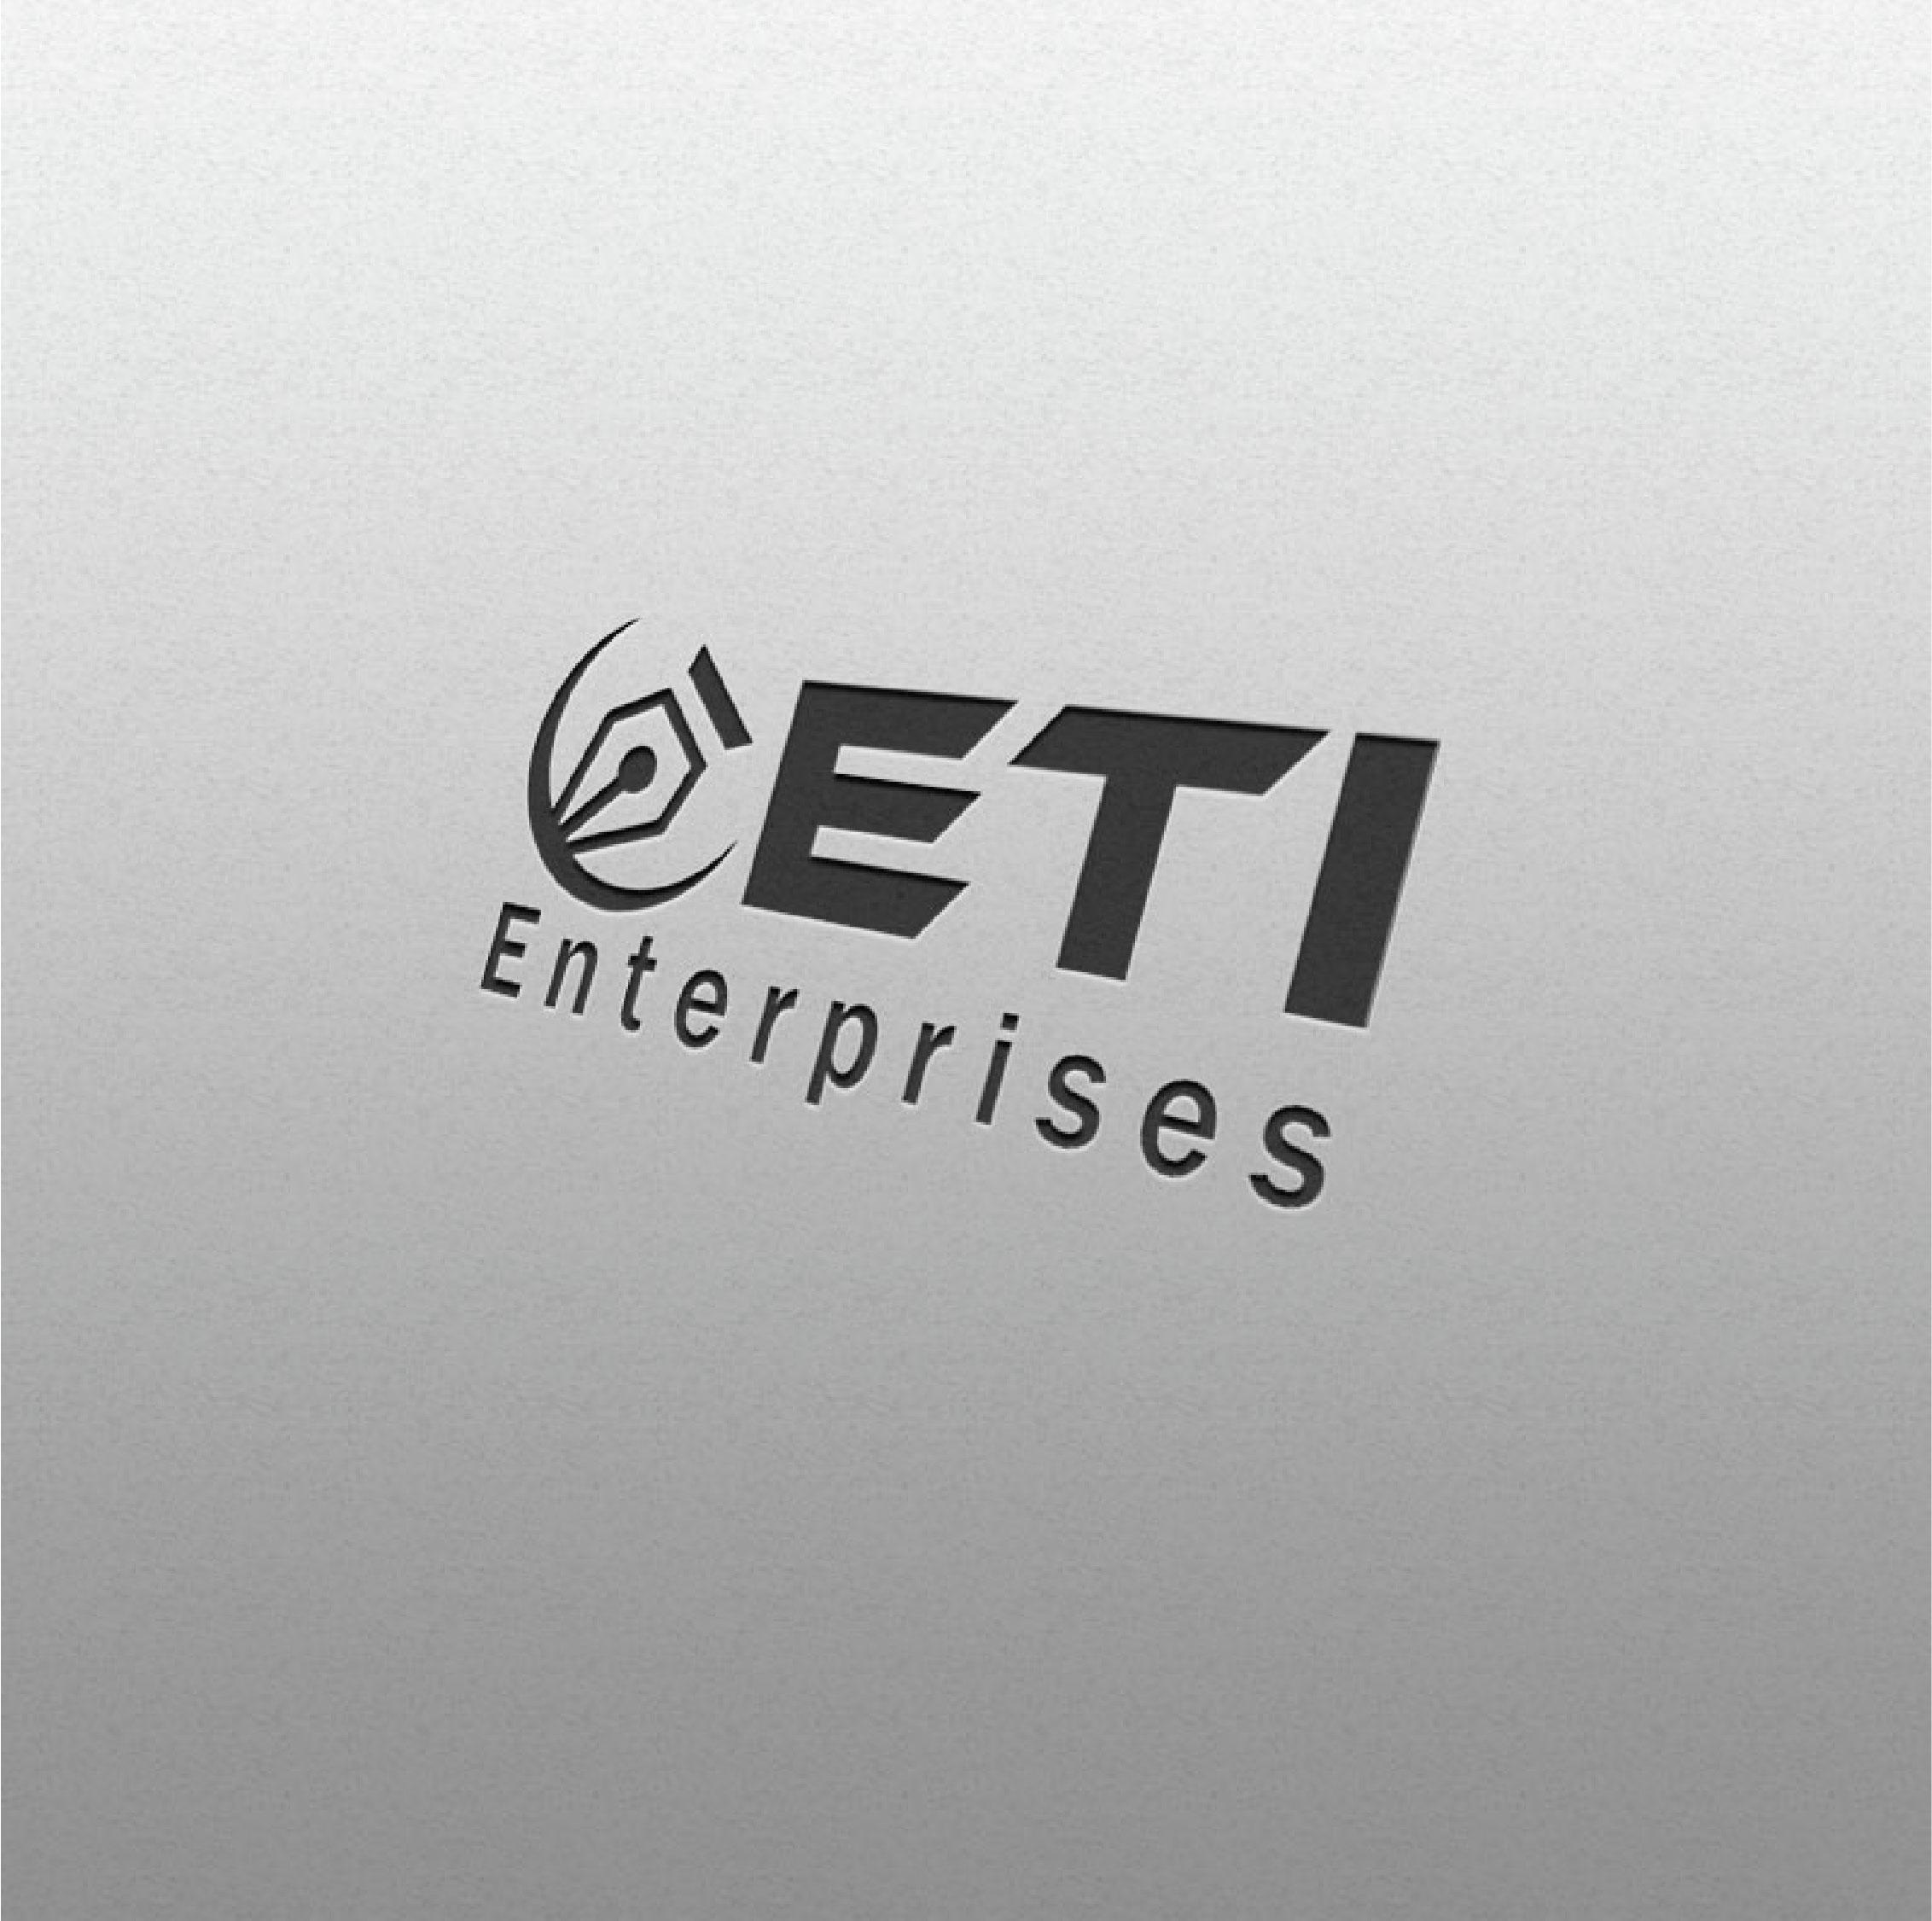 I will design professional website logo